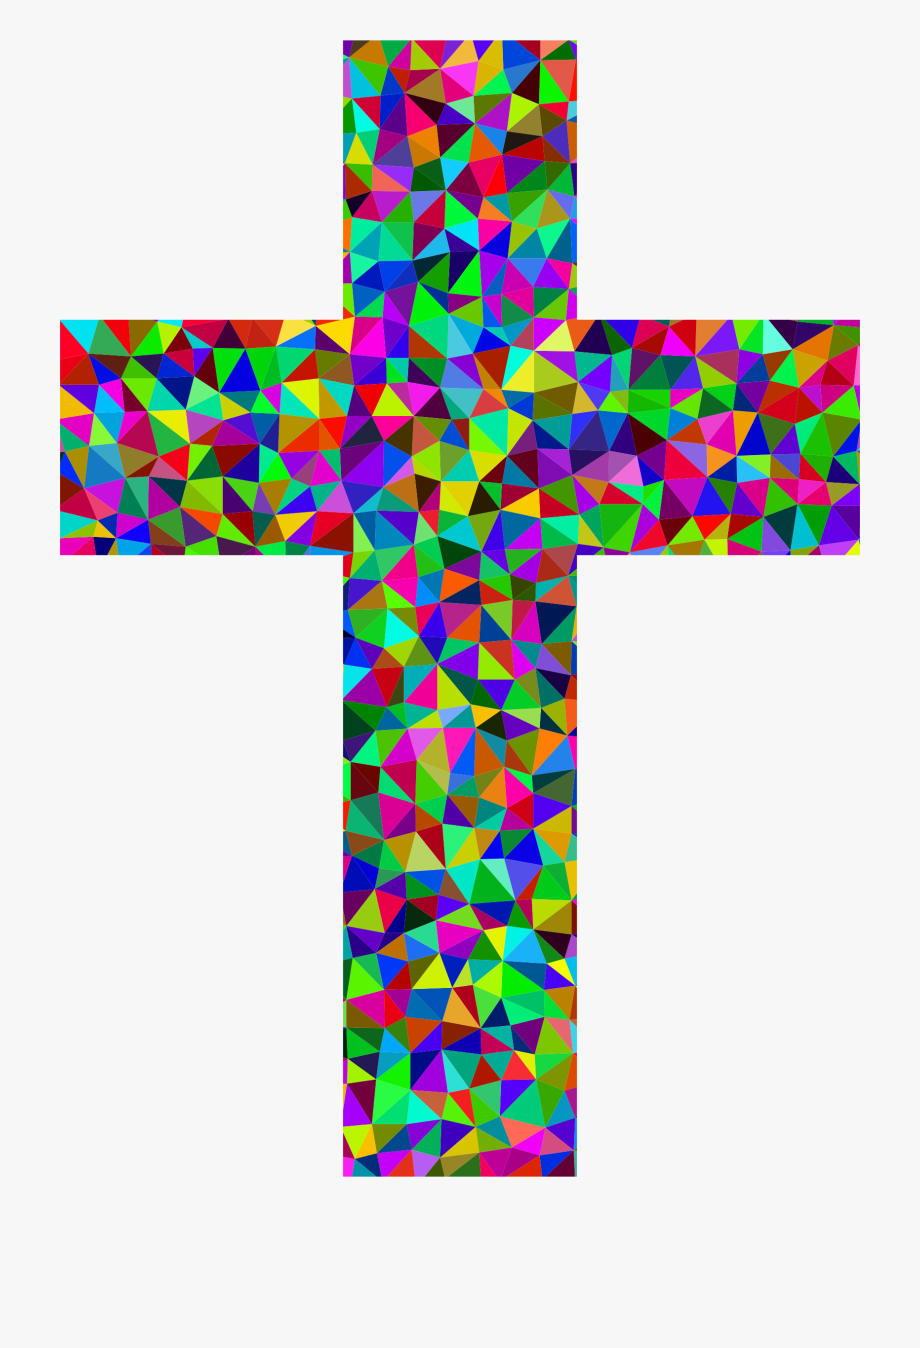 Colored christian cross clipart free vector royalty free Recursos Religion Catlica Fichas - Colorful Cross Png #797705 - Free ... vector royalty free